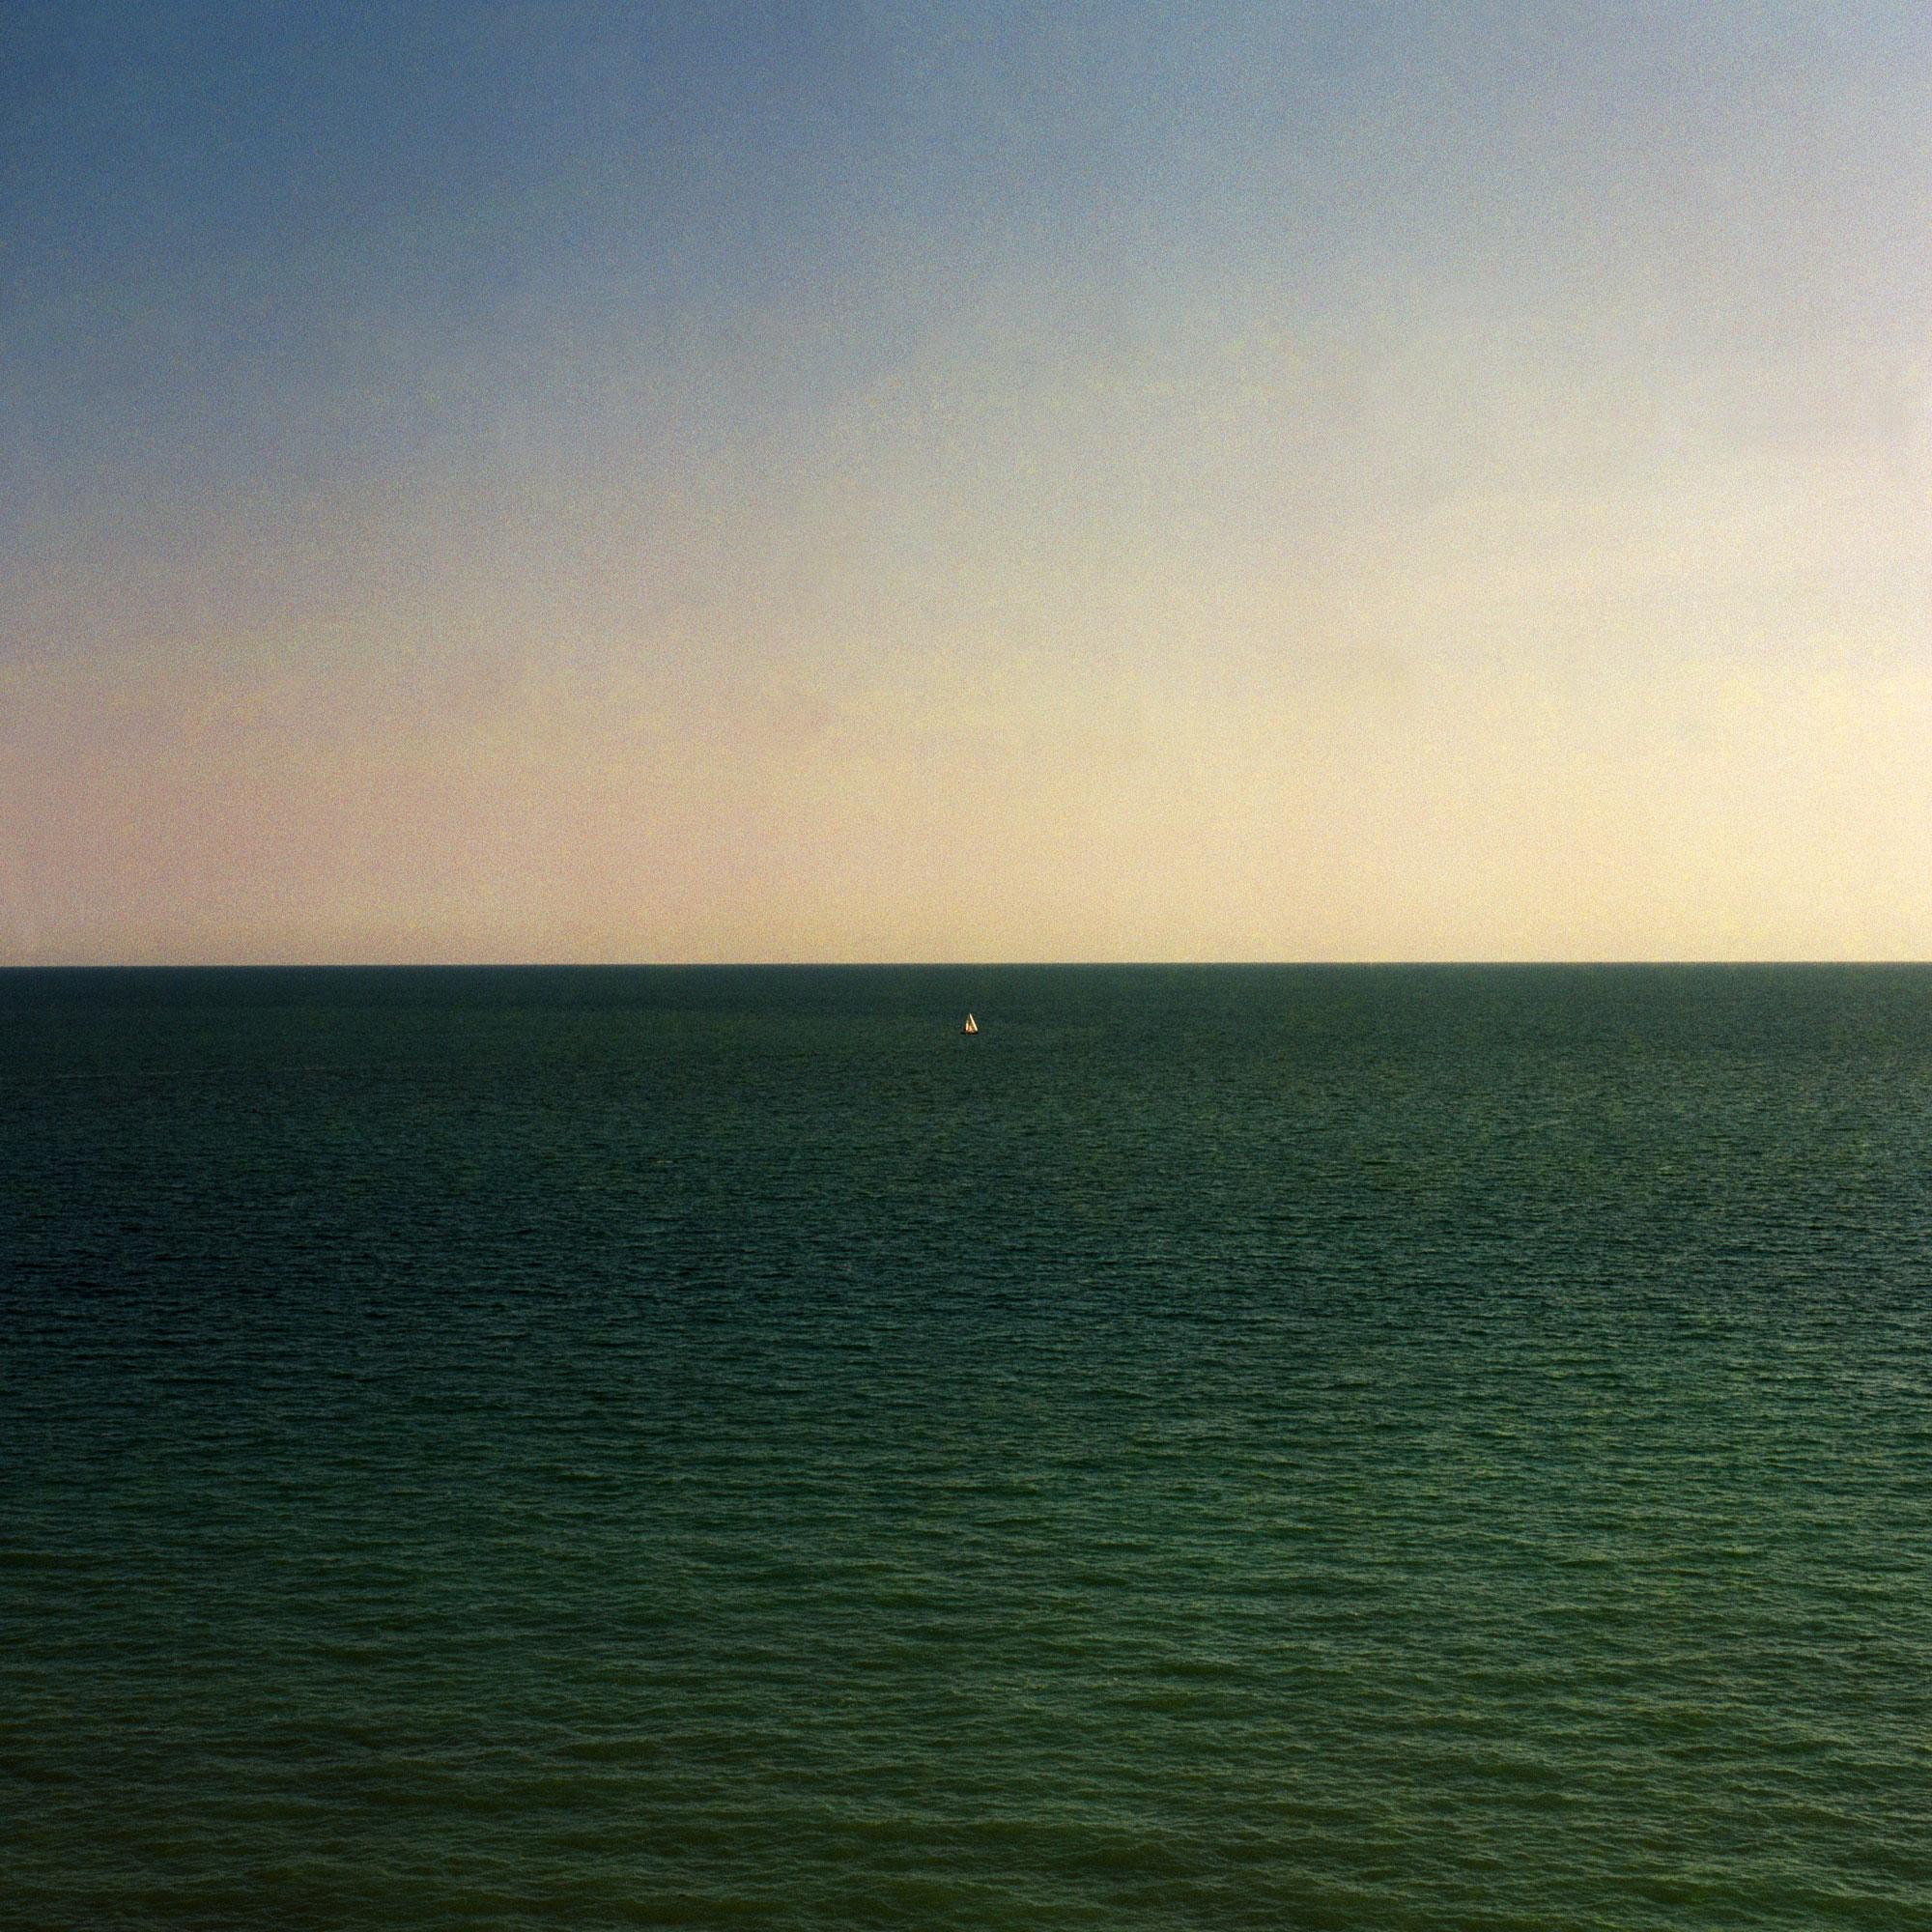 Sailing on the open sea. Seascape on film by ioannis koussertari.